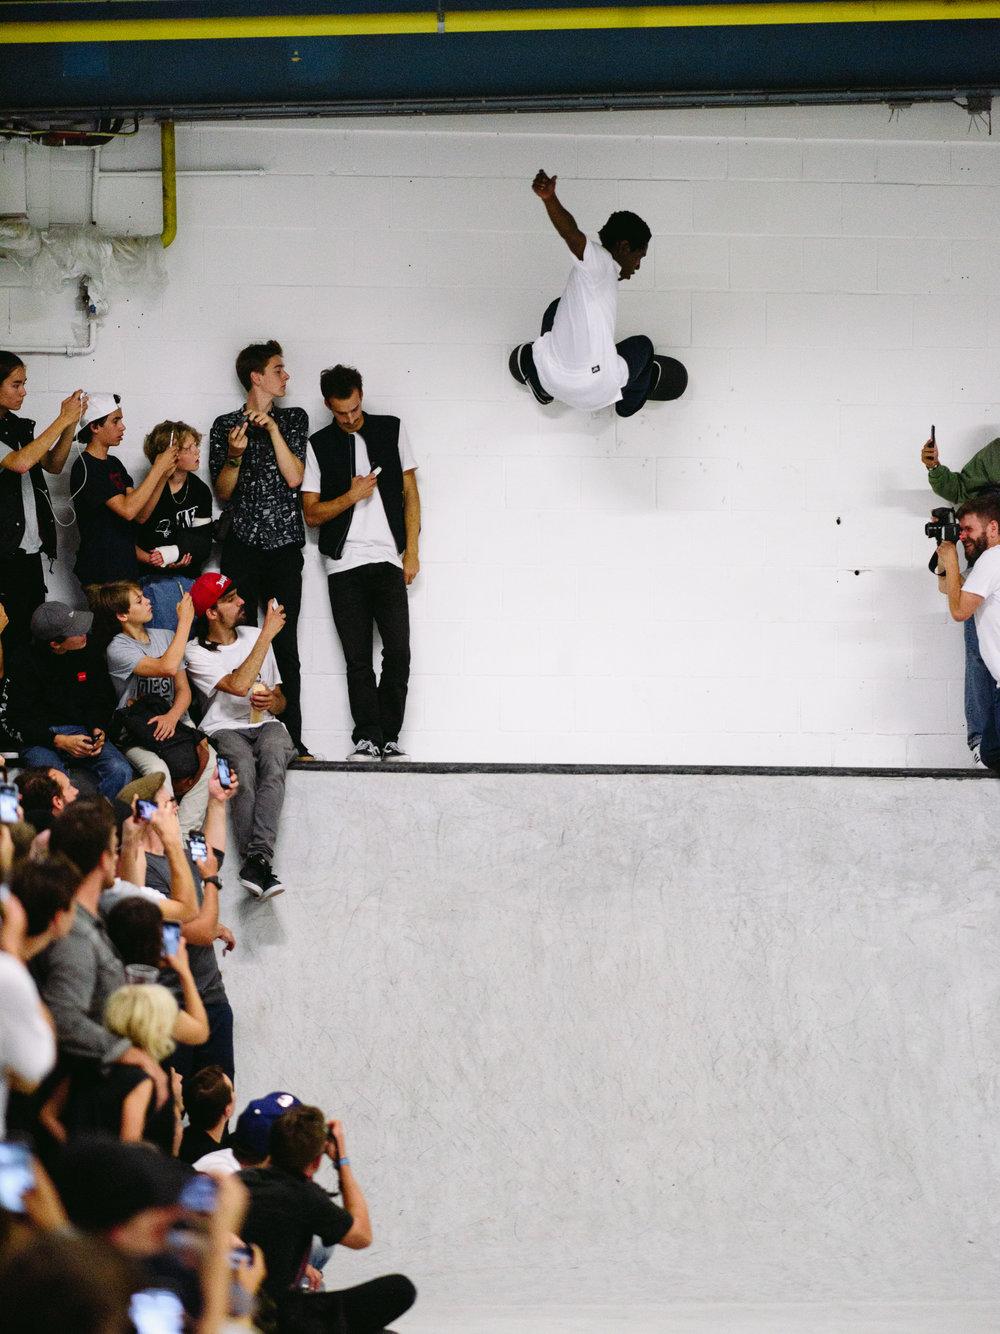 _IHC1963e-Nike-SB-Noord-Demo-Amsterdam-July-2017-Photographer-Maksim-Kalanep.jpg